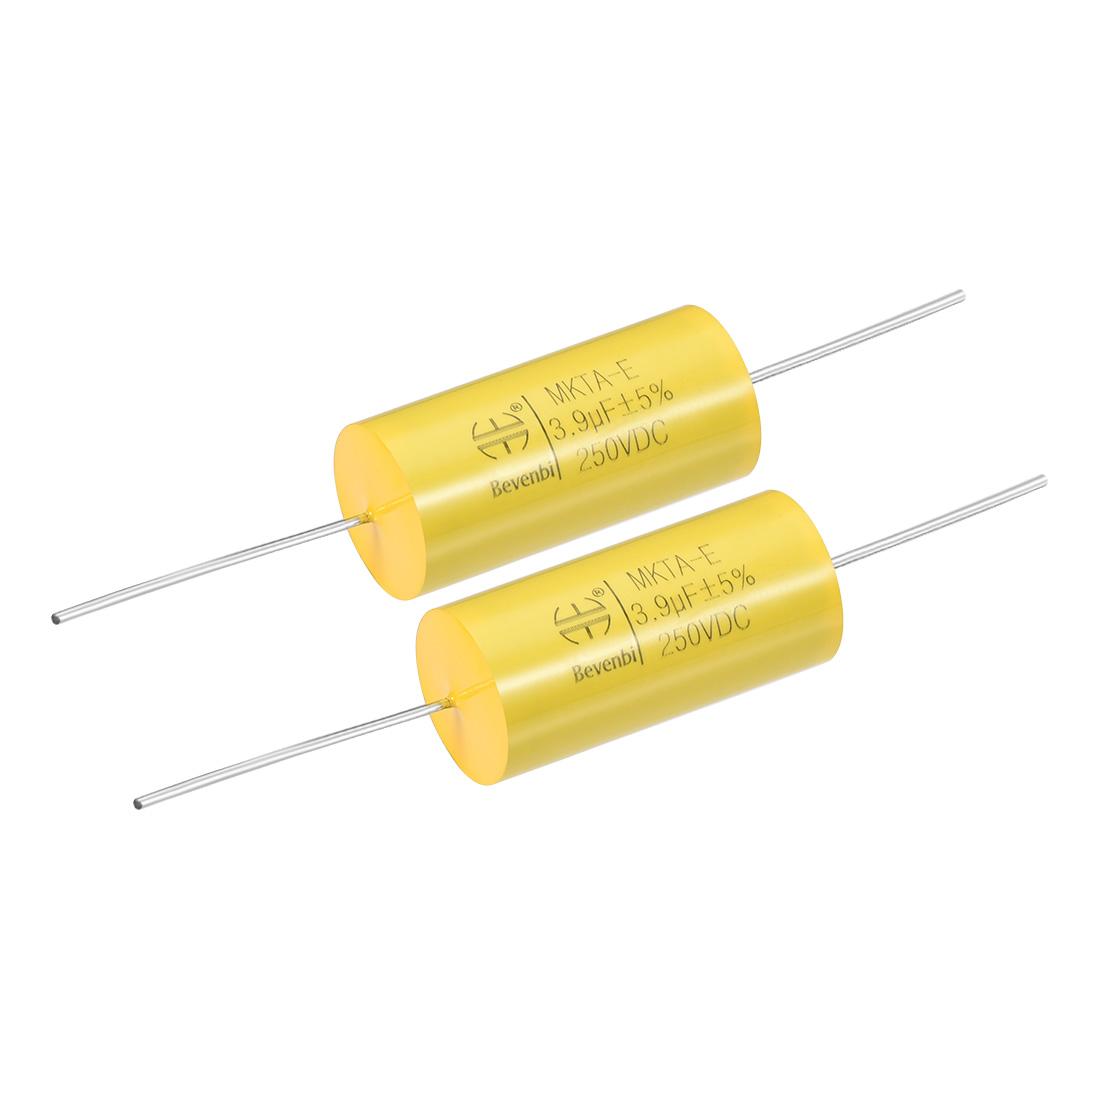 Film Capacitor 250V DC 3.9uF MKTA-E Round Polypropylene Capacitors Yellow 2pcs